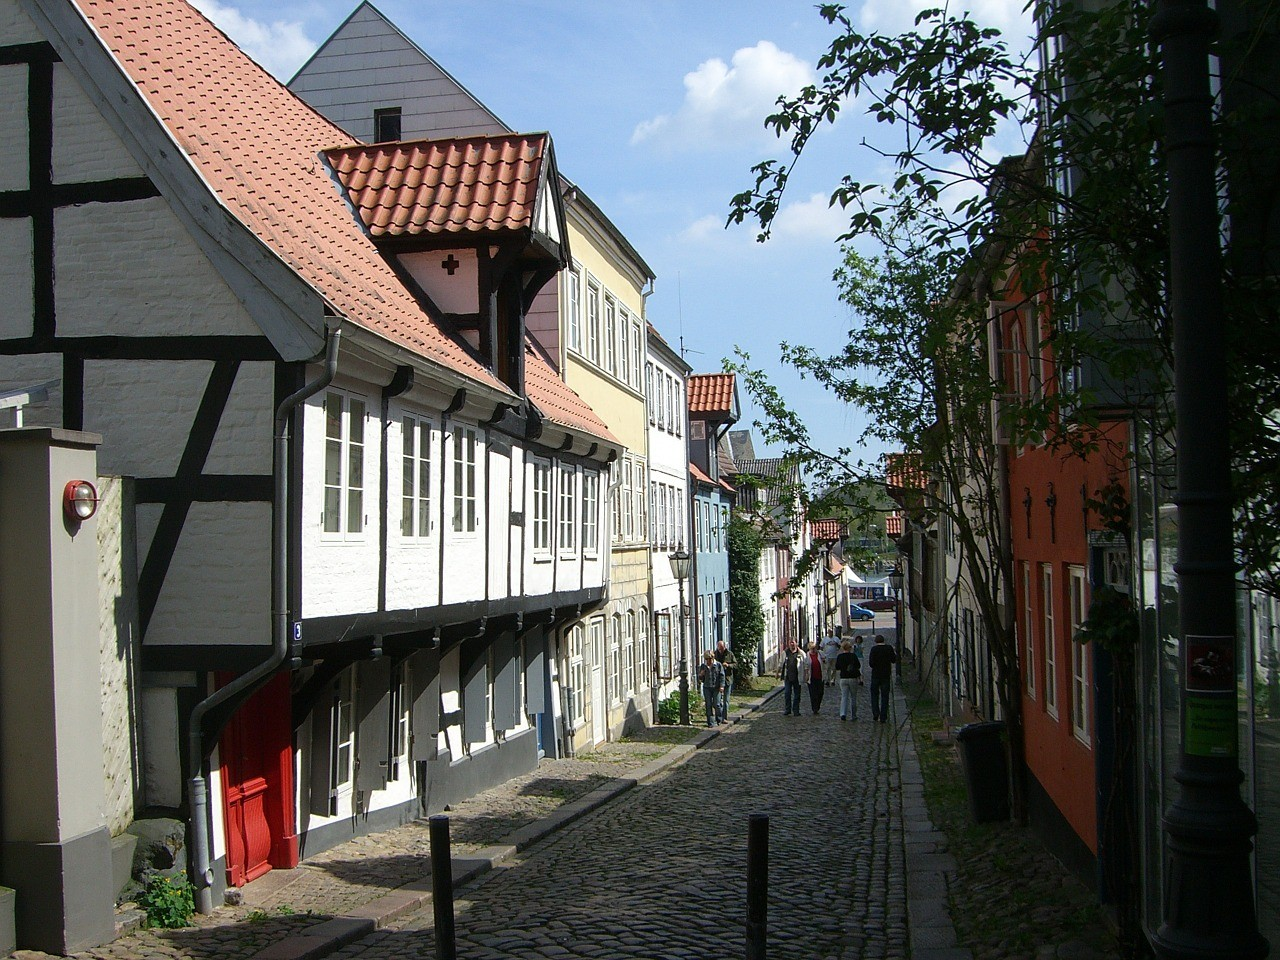 Hinterhof in Flensburg